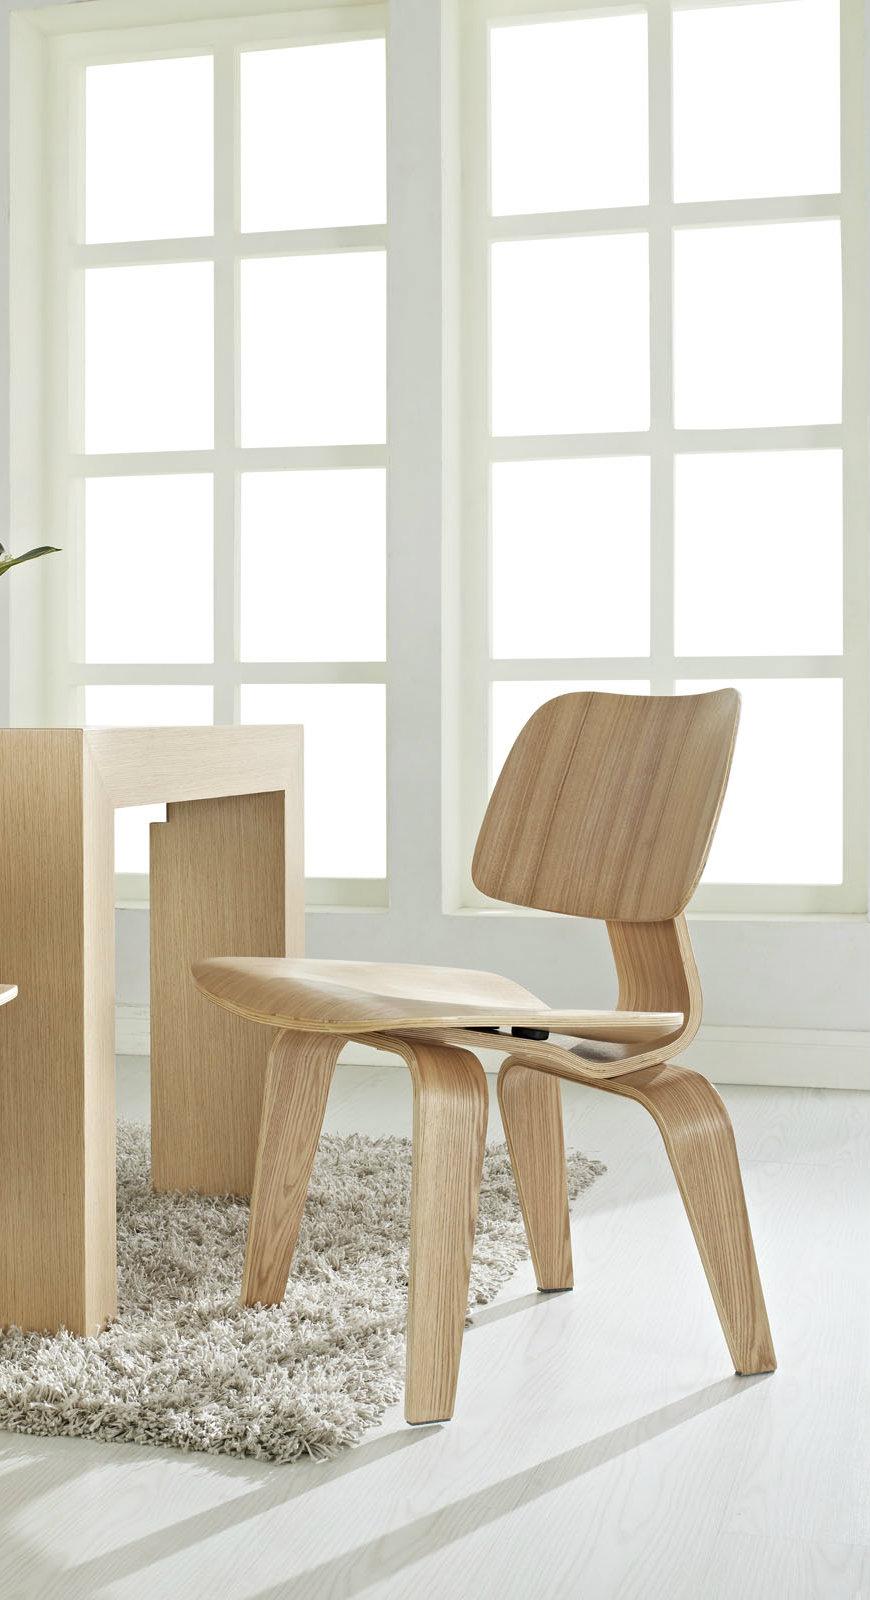 5 Mid-century Modern Dining Chairs  mid-century modern dining chairs TOP 5 Mid-century Modern Dining Chairs 5 Mid century Modern Dining Chairs 5